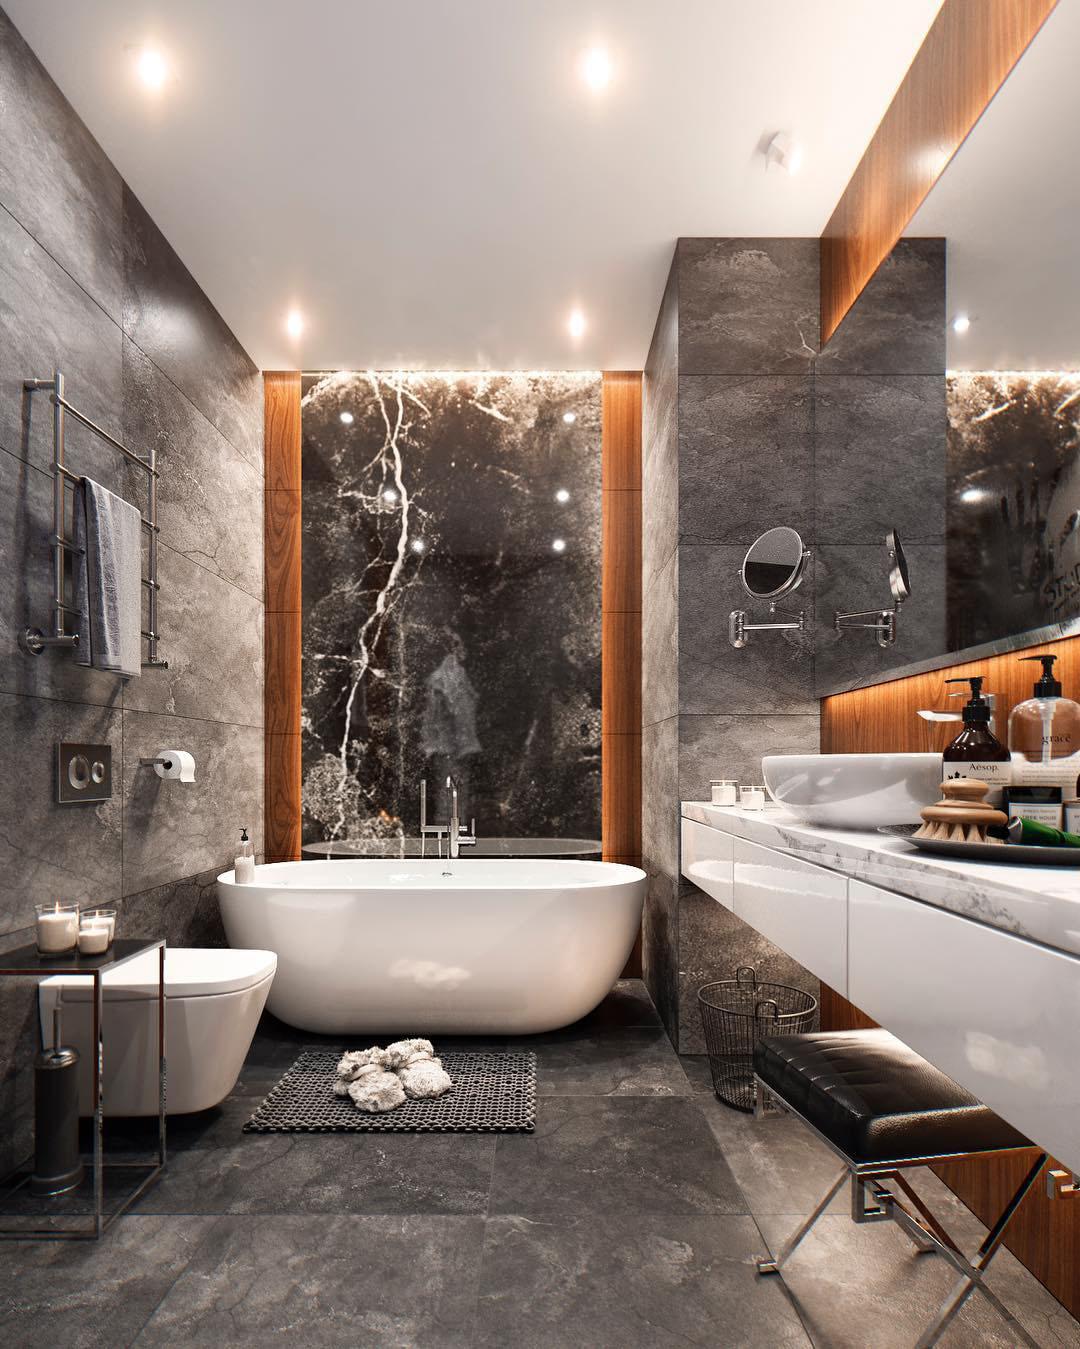 Spa-Like Bathroom by Studia 54